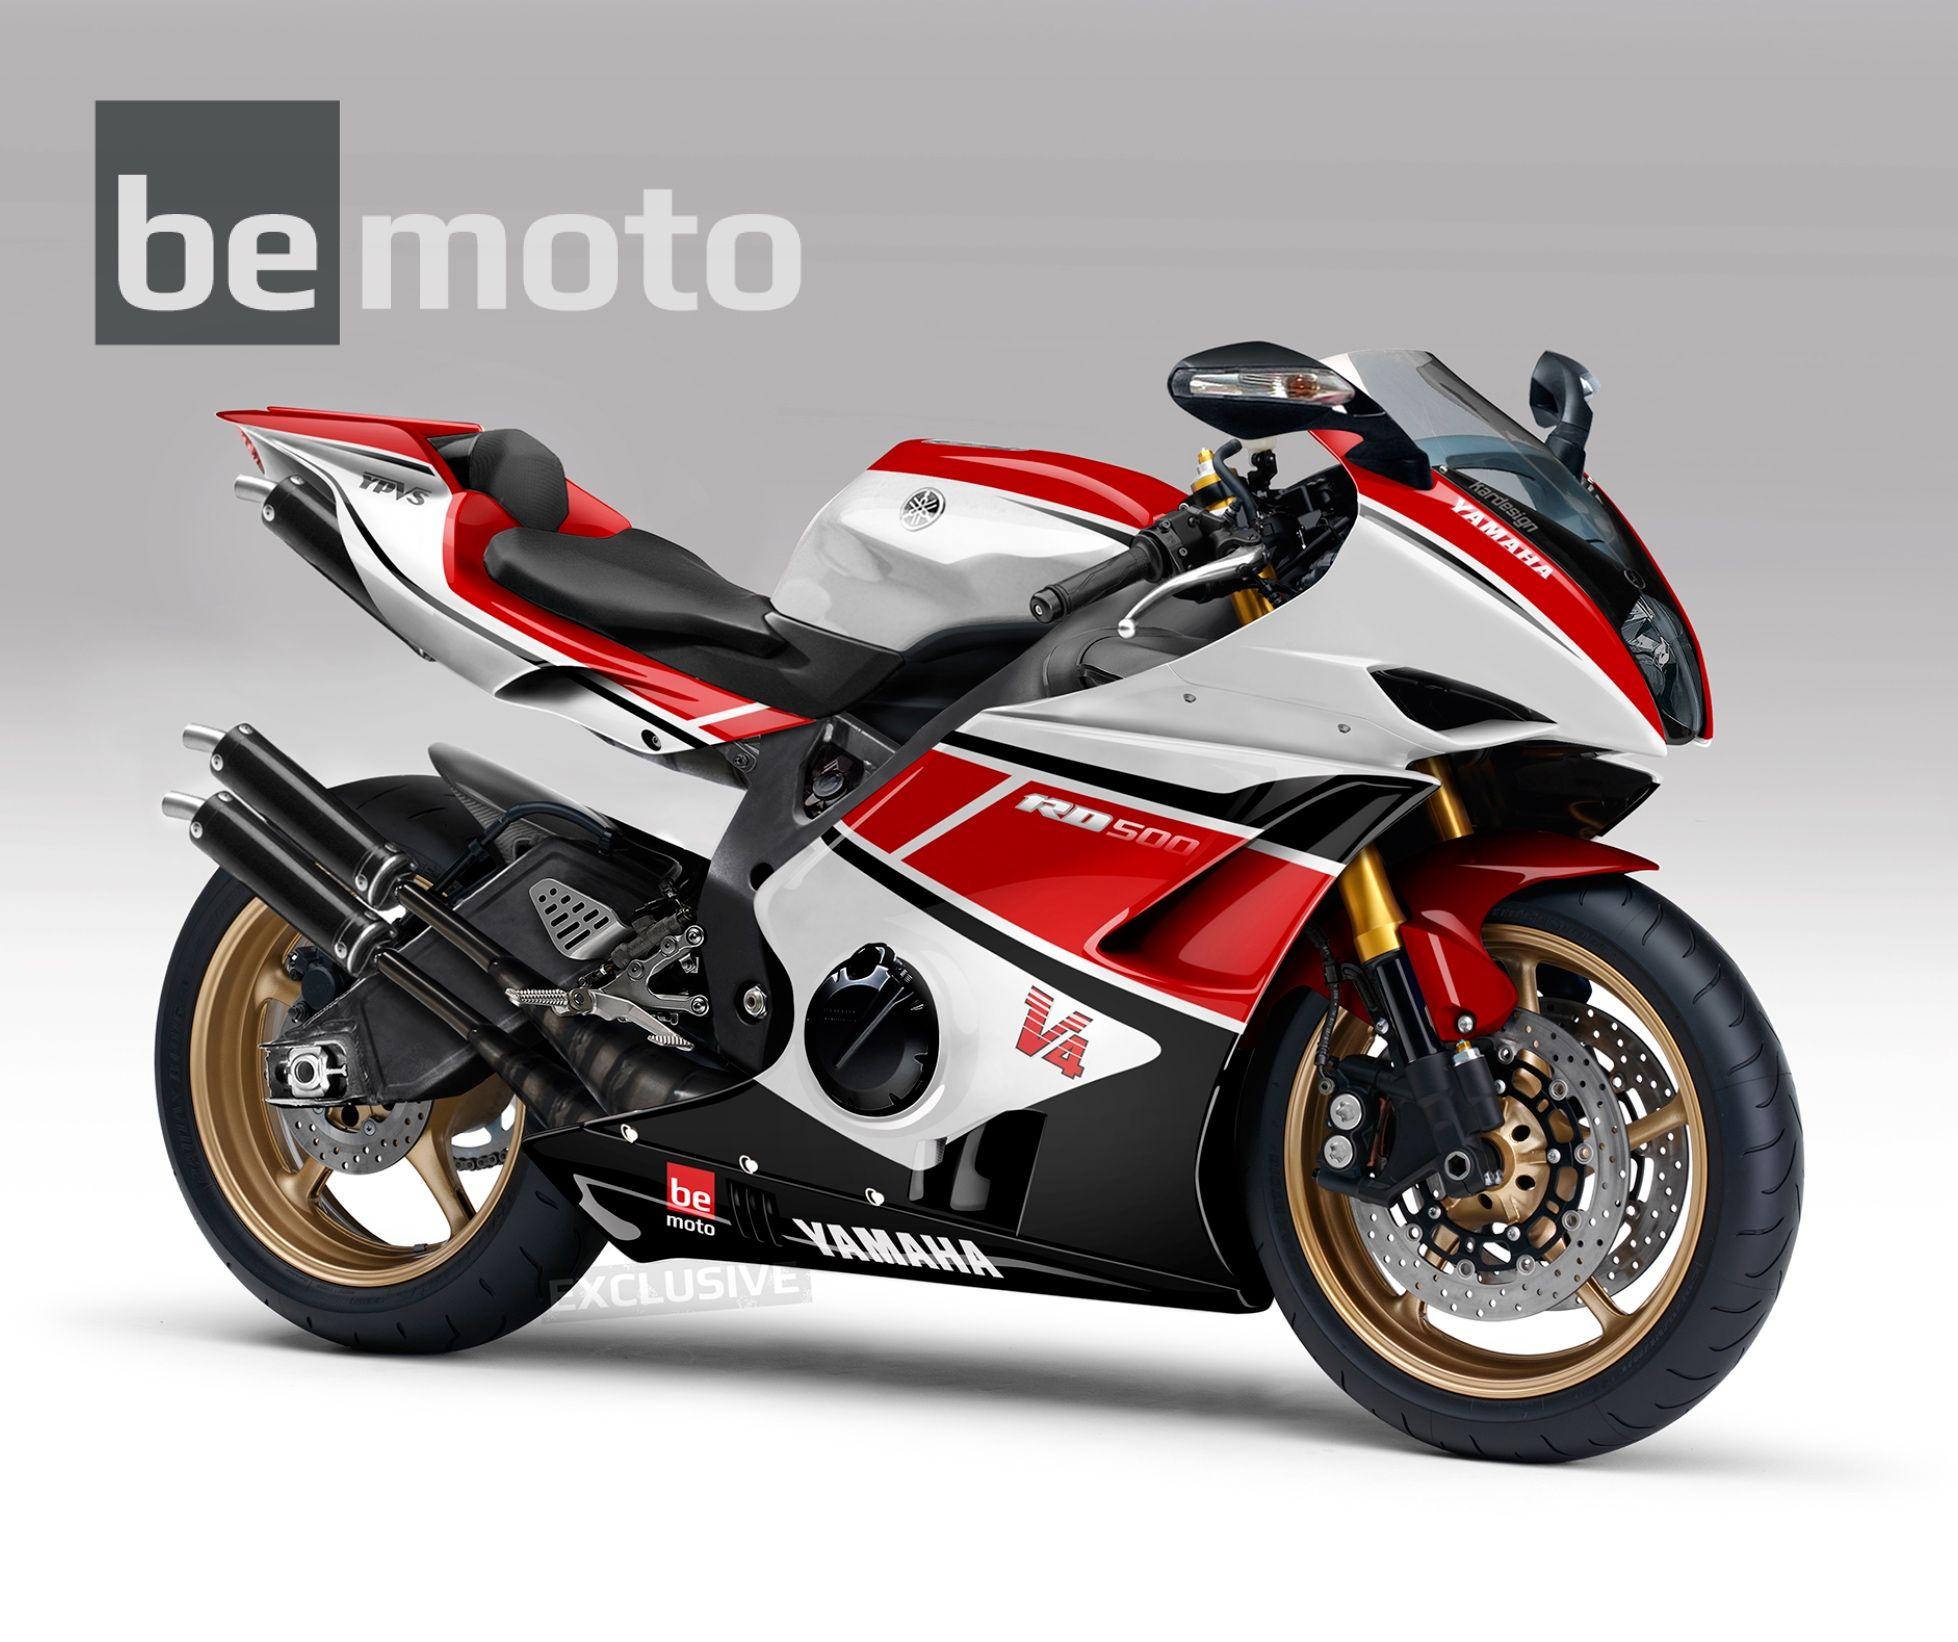 medium resolution of bemoto rd500lc concept 2016